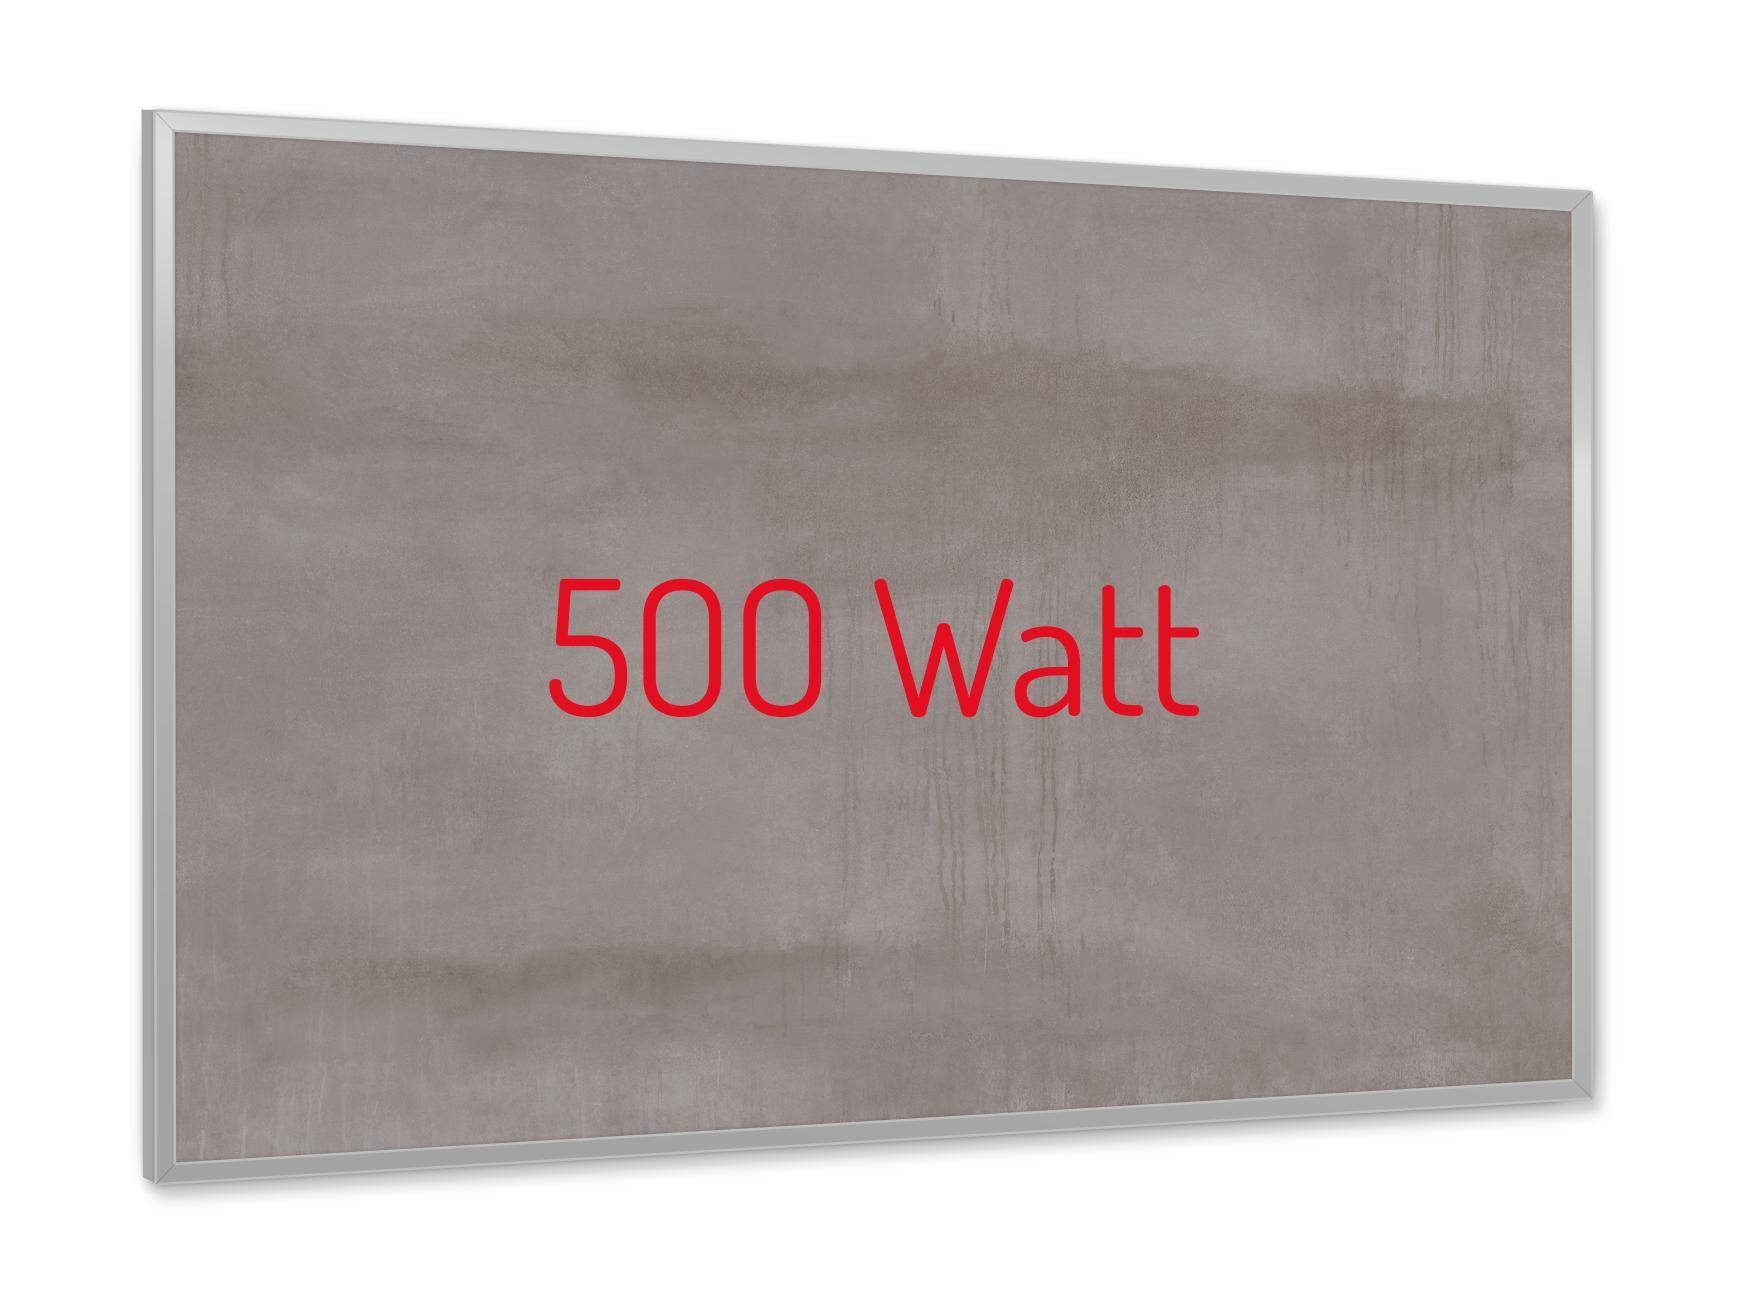 PowerSun Keramik Struktur Paris 500 Watt 60x90cm